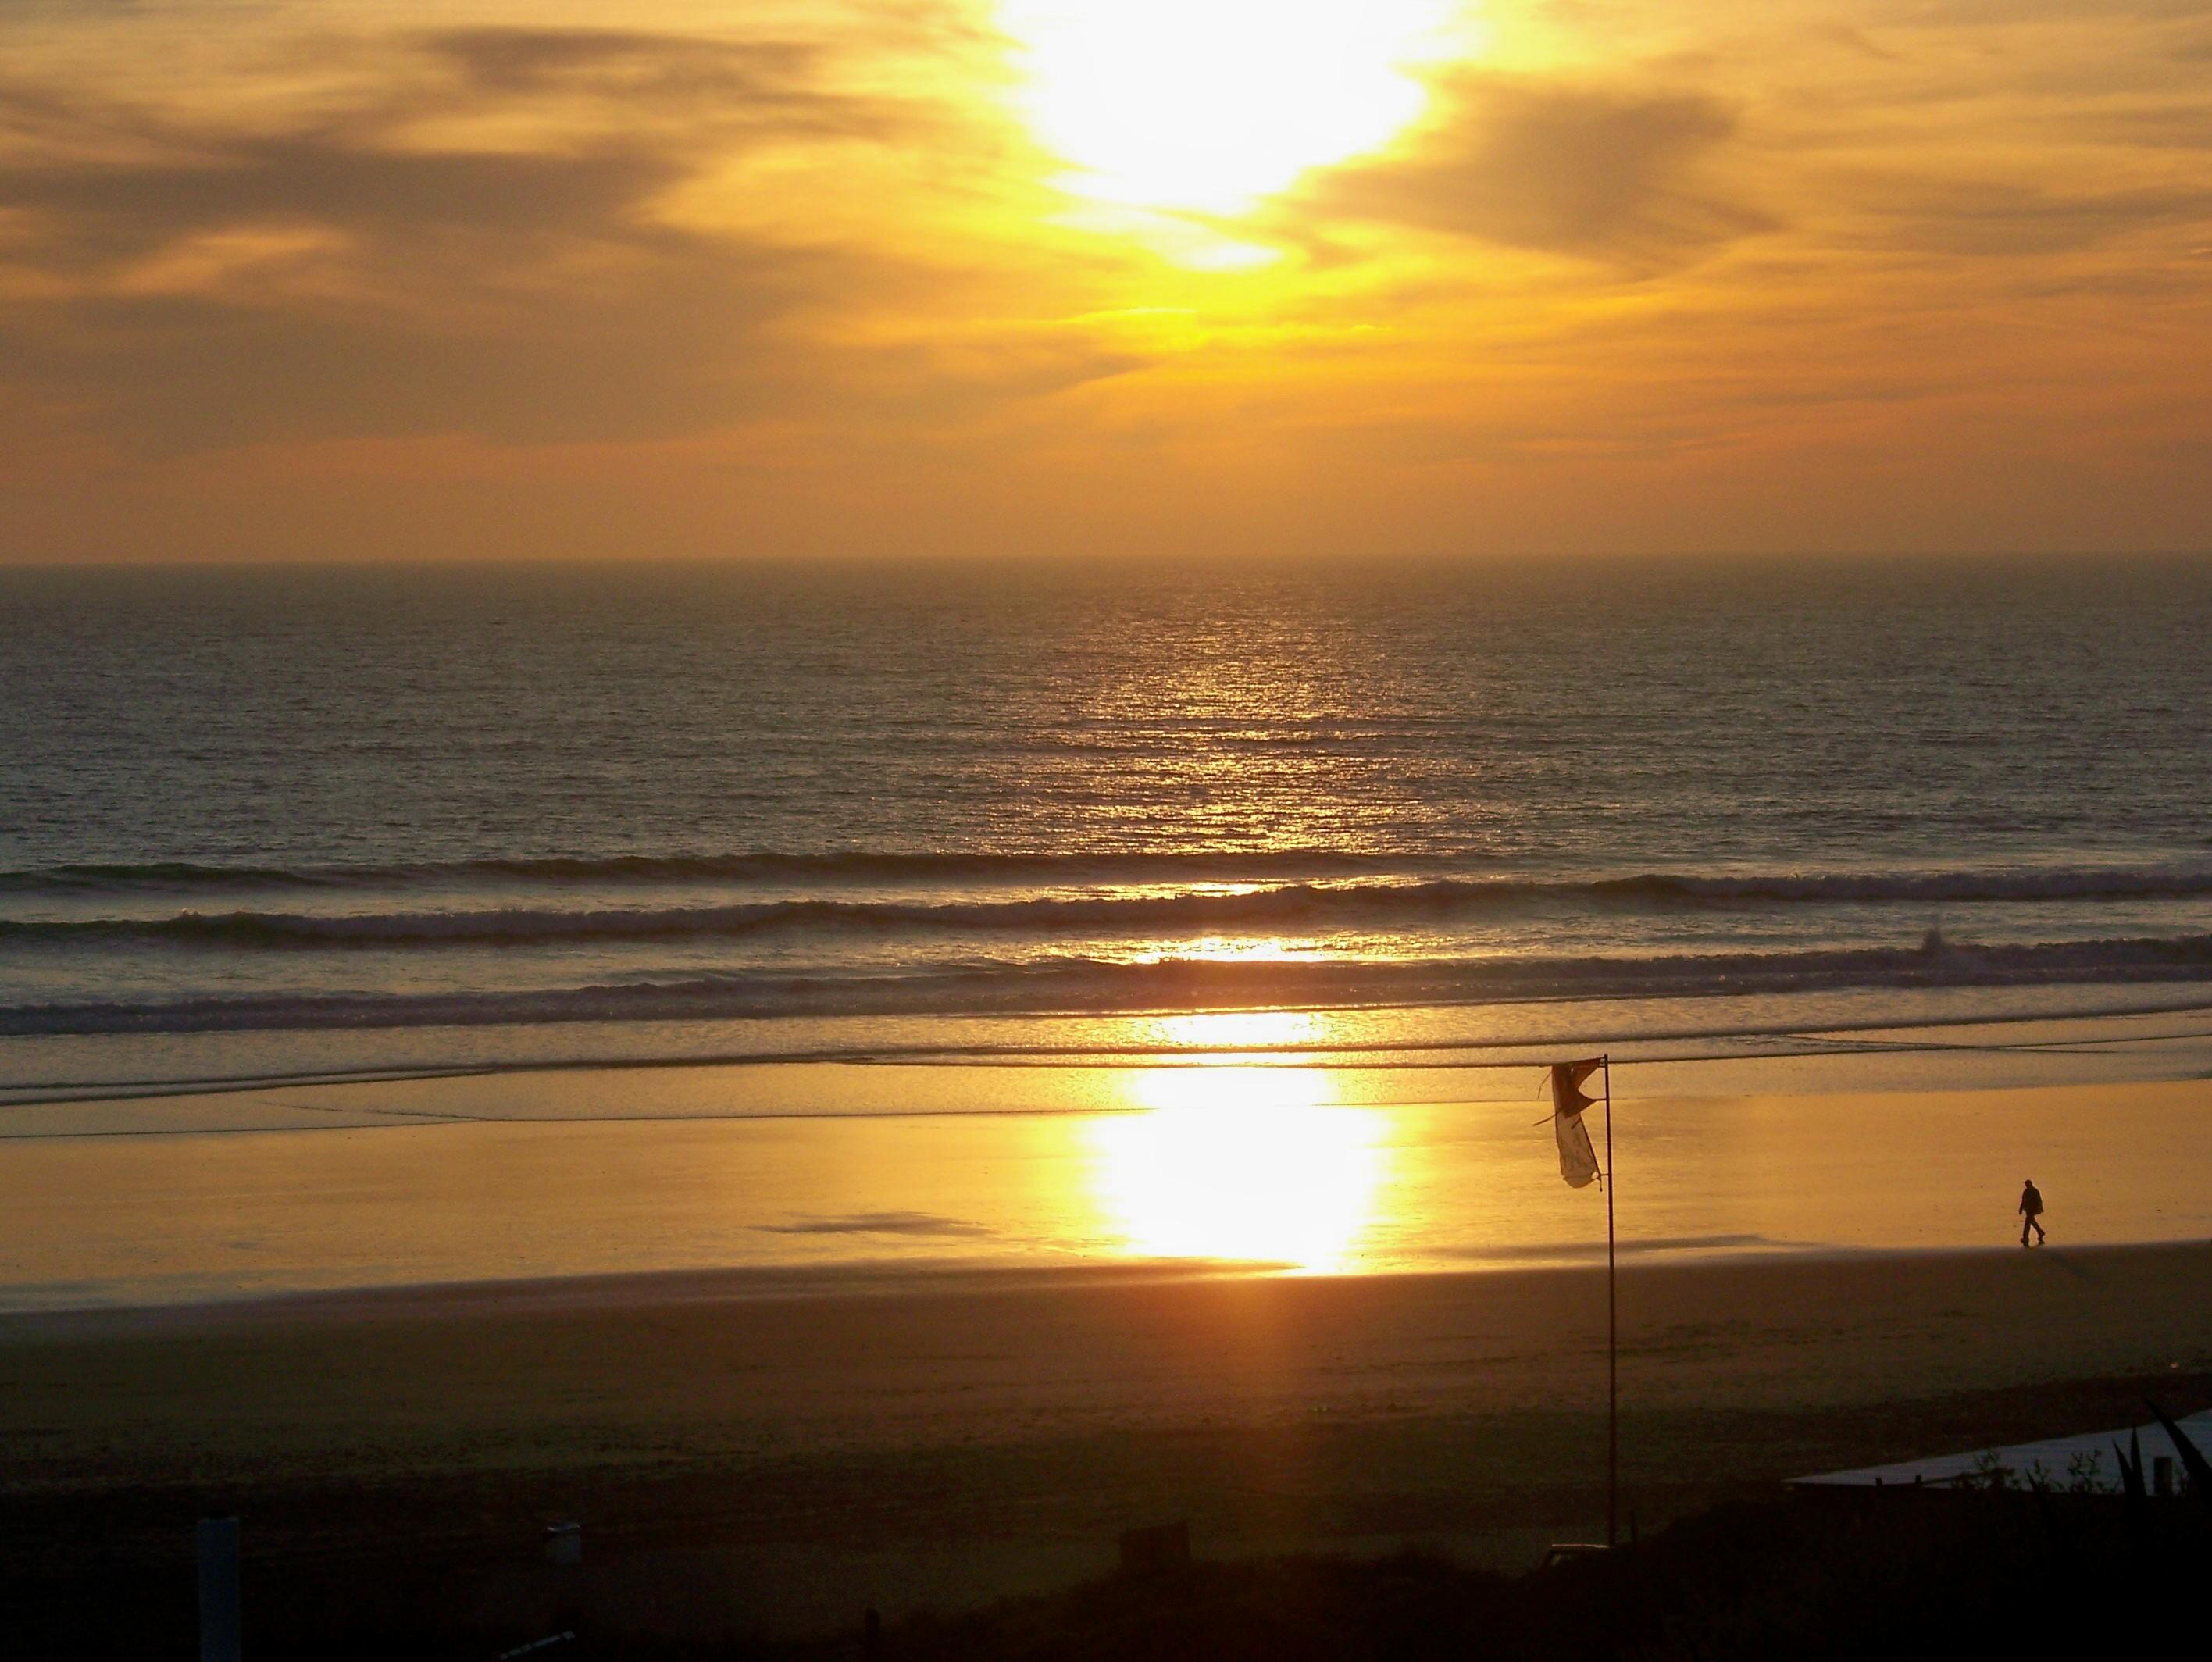 File puesta de sol jpg wikimedia commons for Puesta de sol